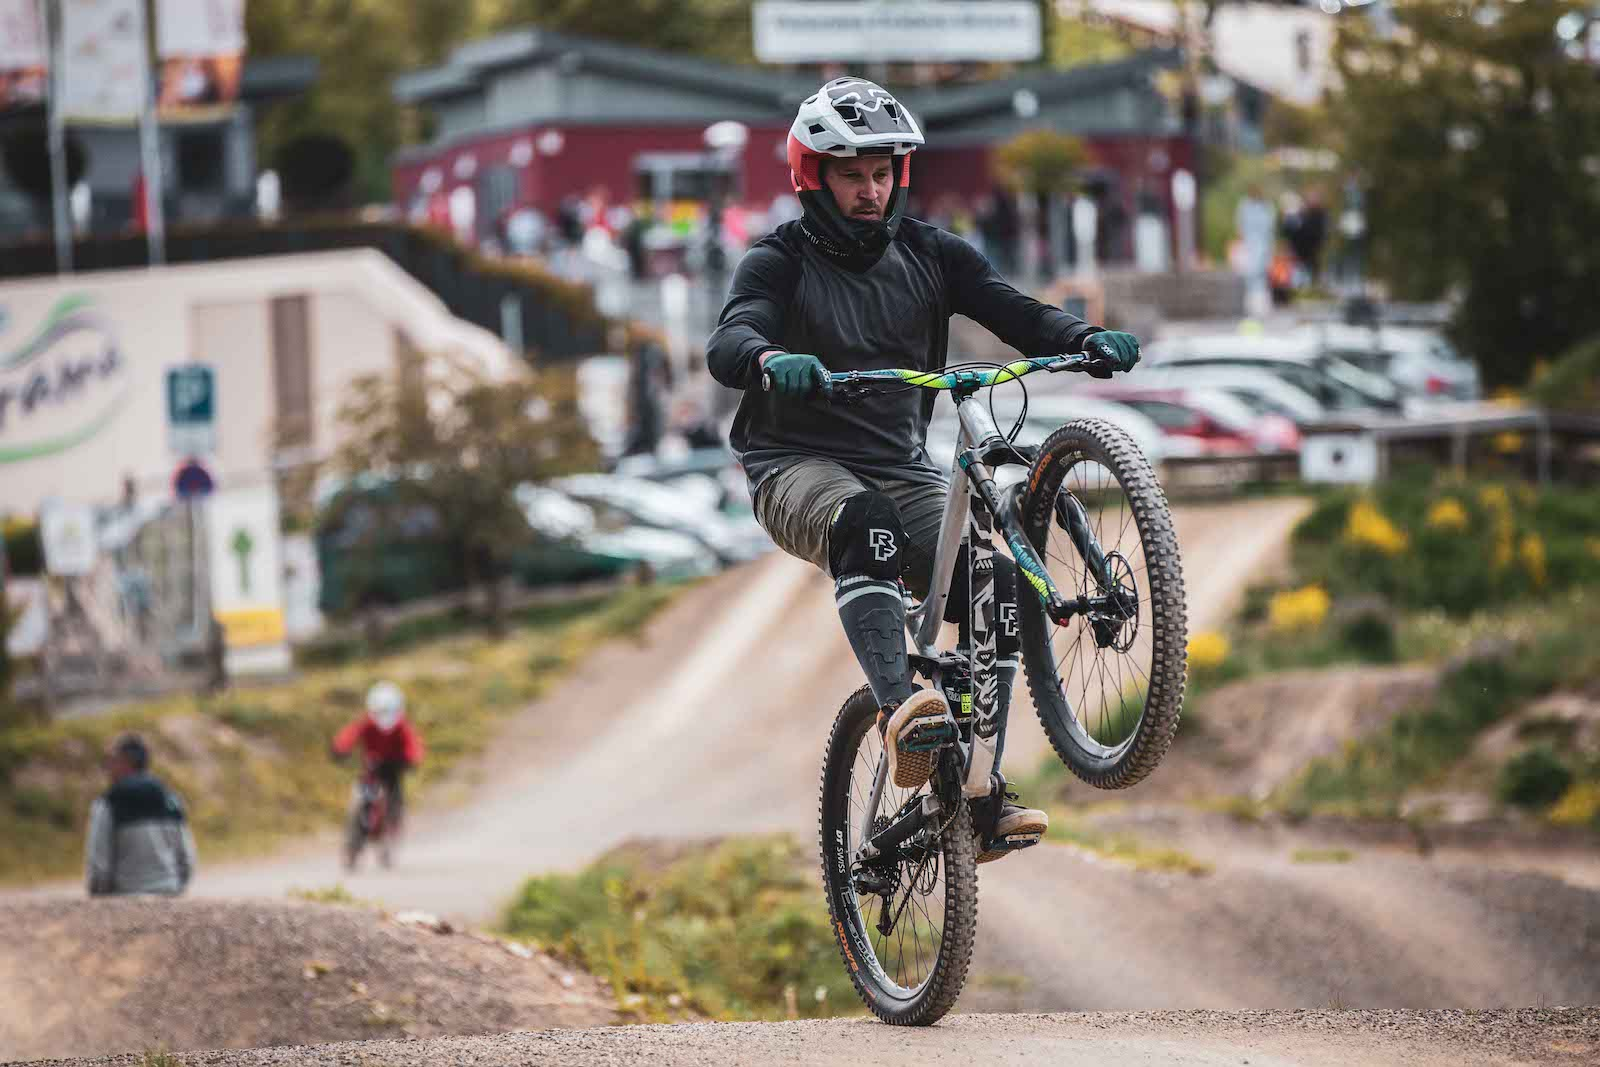 Bikepark Basics+ Fahrtechnik Kurs Samerberg - Fahrtechnik Training - Rock my Trail Bikeschule